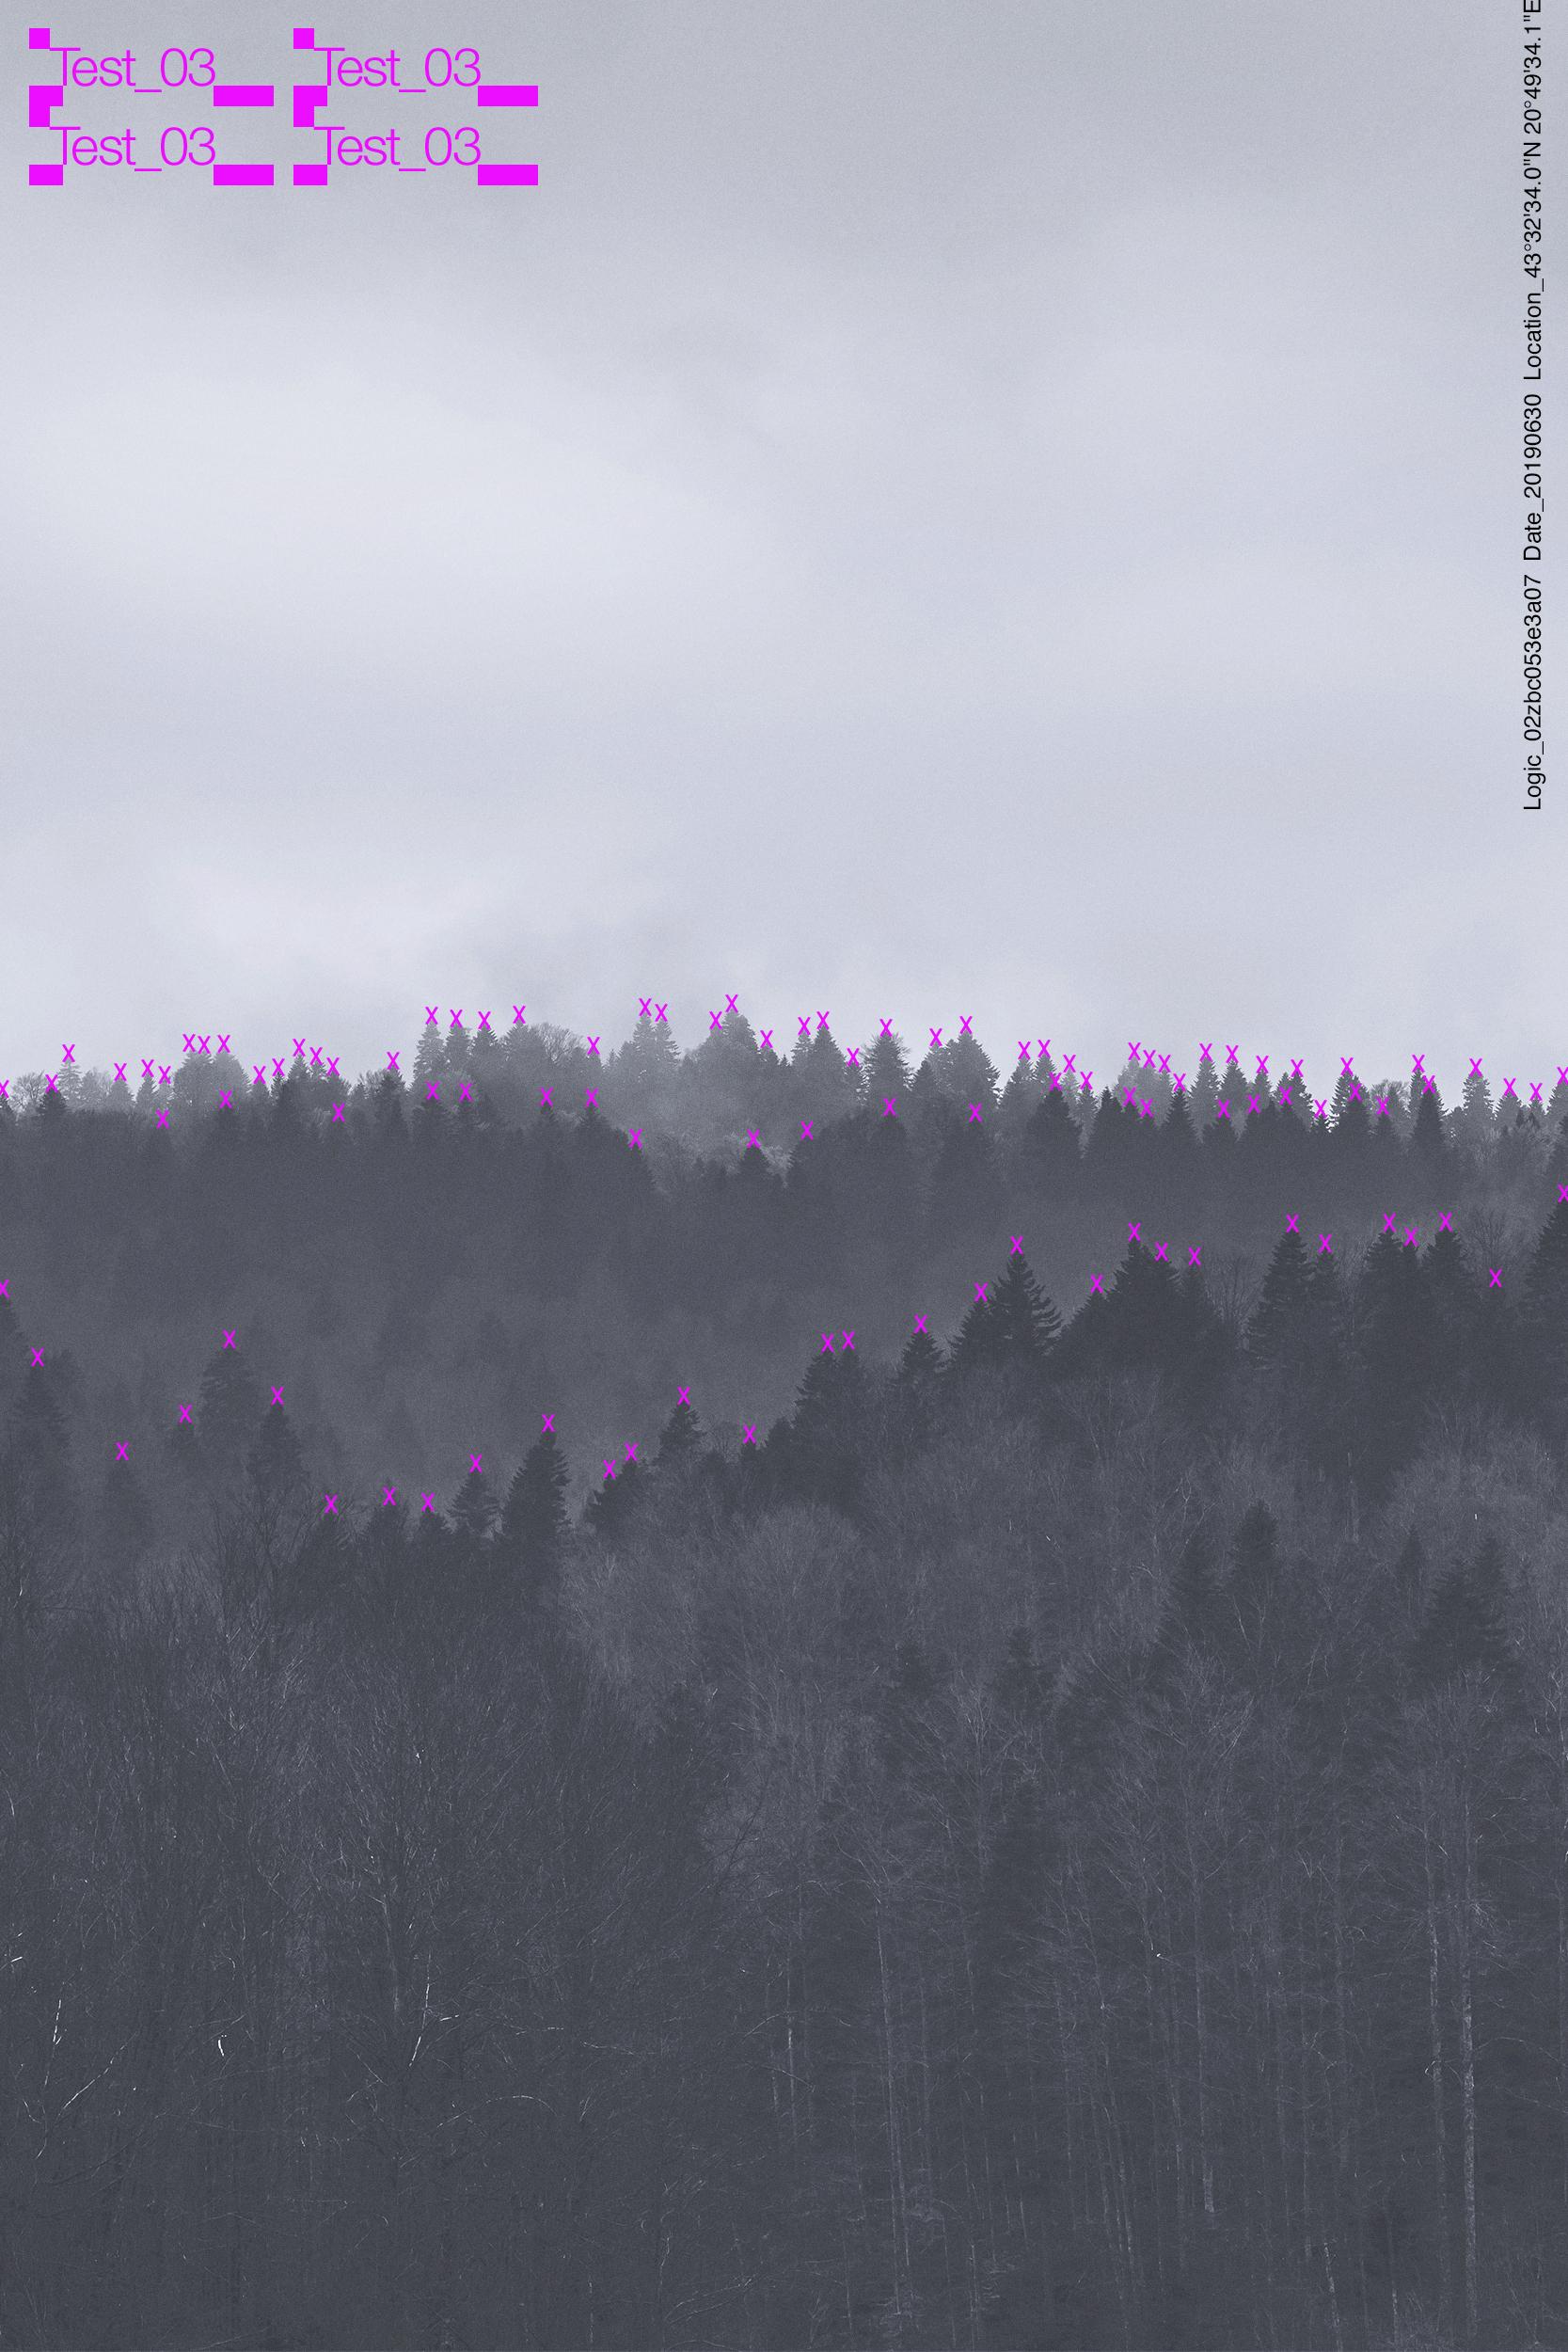 01_Forest_3_V3